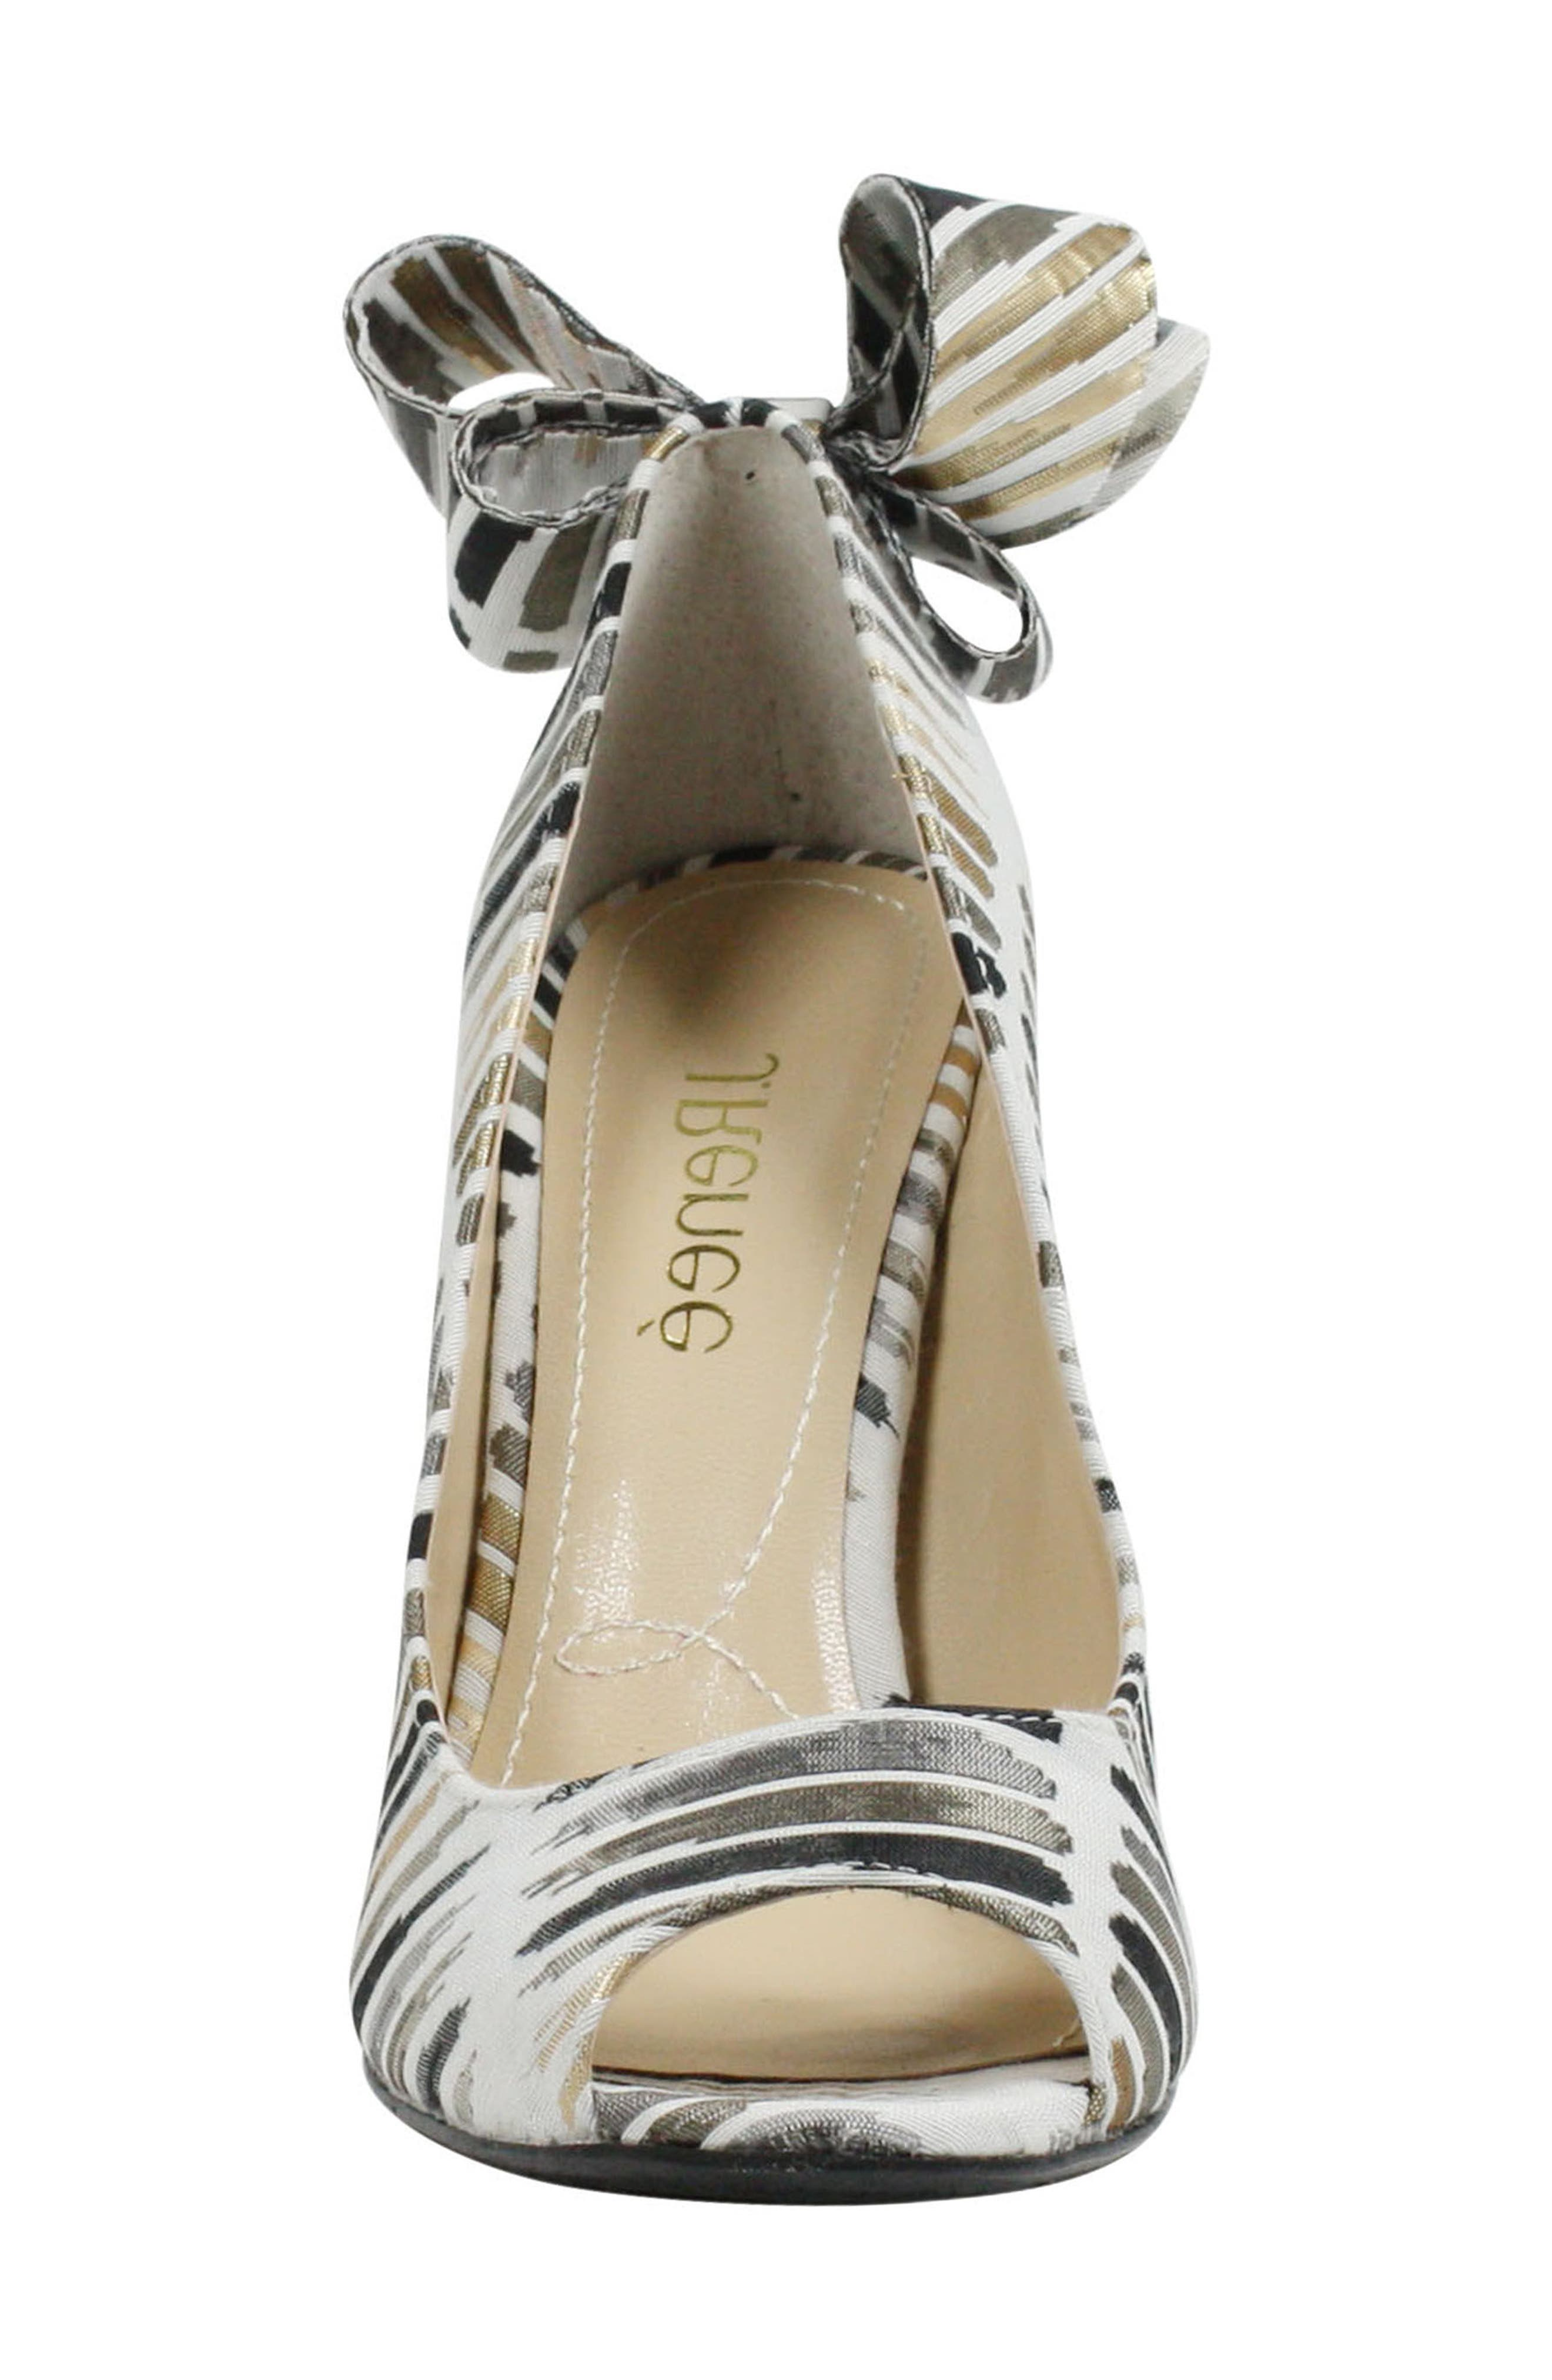 Ellasee Bow Peep Toe Pump,                             Alternate thumbnail 4, color,                             Cream/ Black/ Gold Fabric